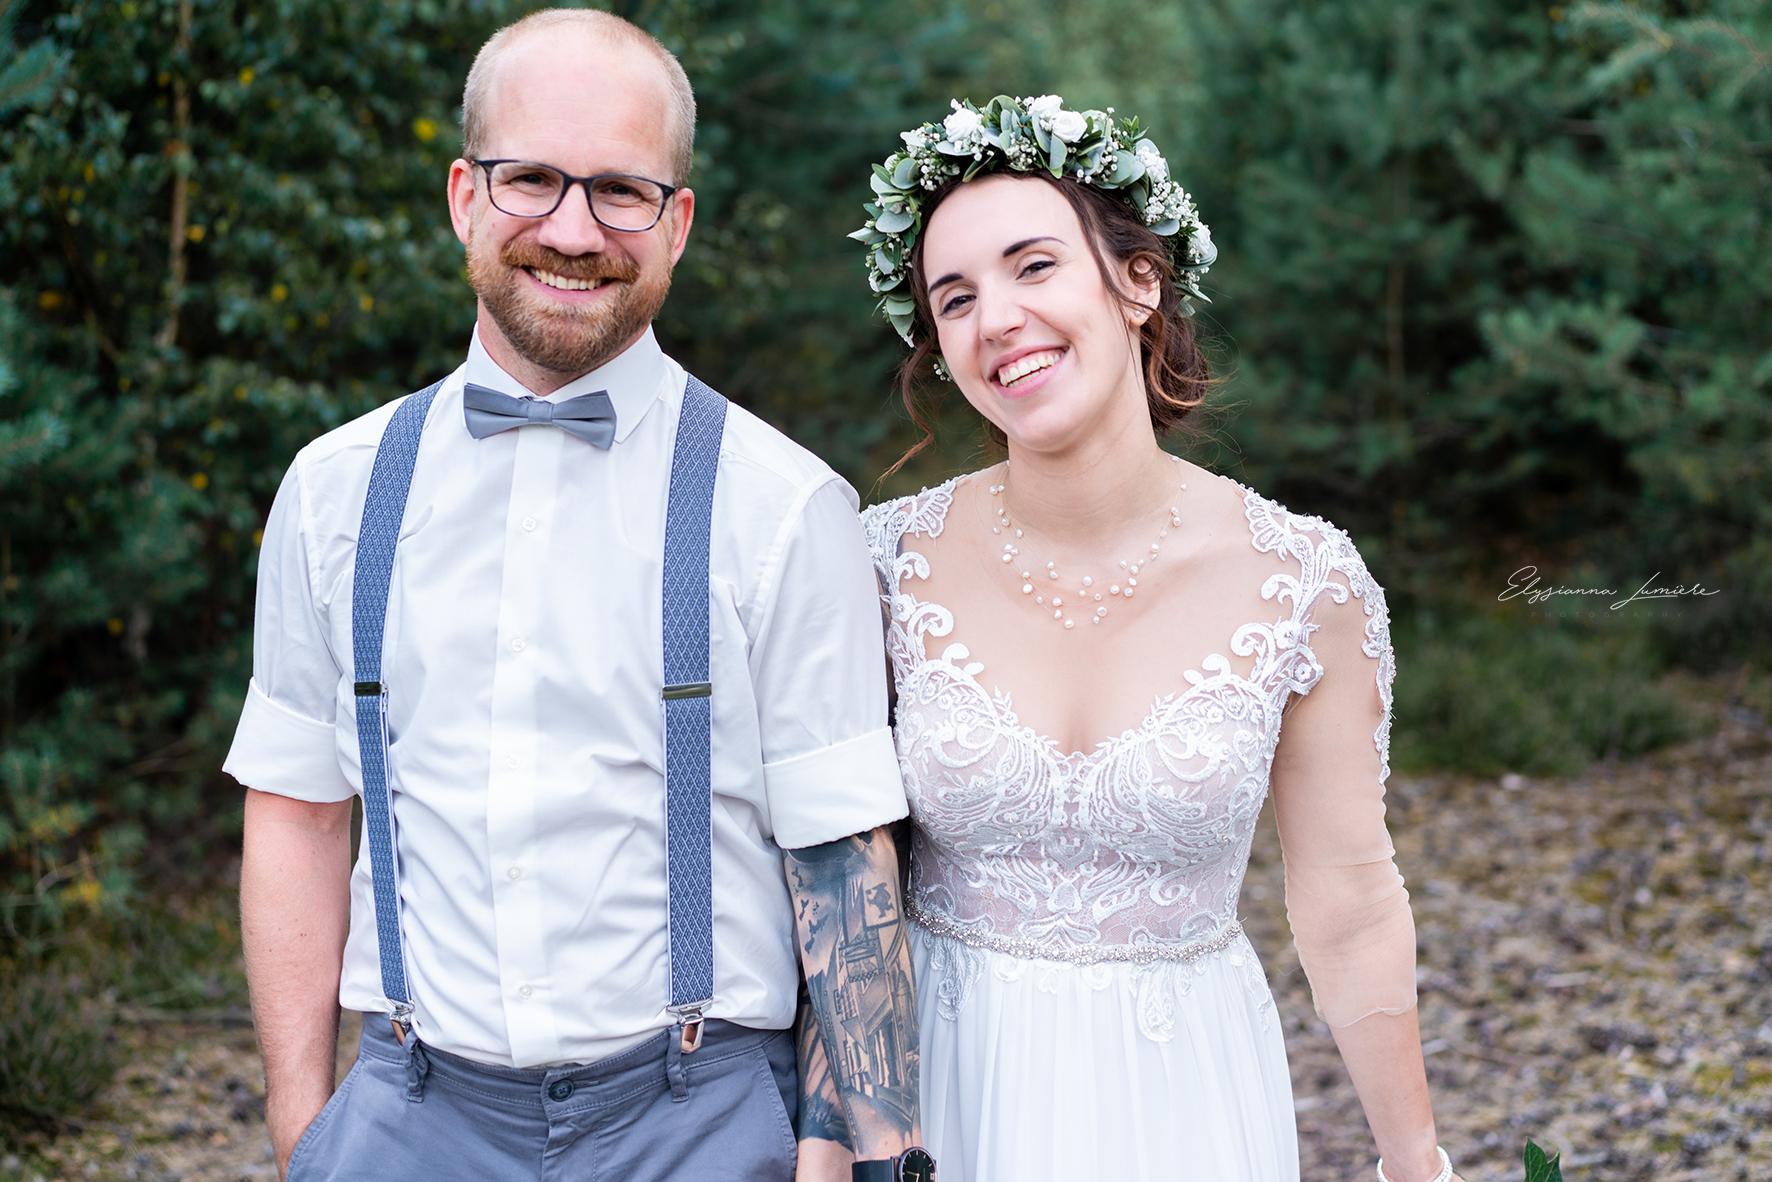 Brautpaar Spaziergang im Wald Hochzeitsfotograf Bremen I Elysianna Lumière Photography